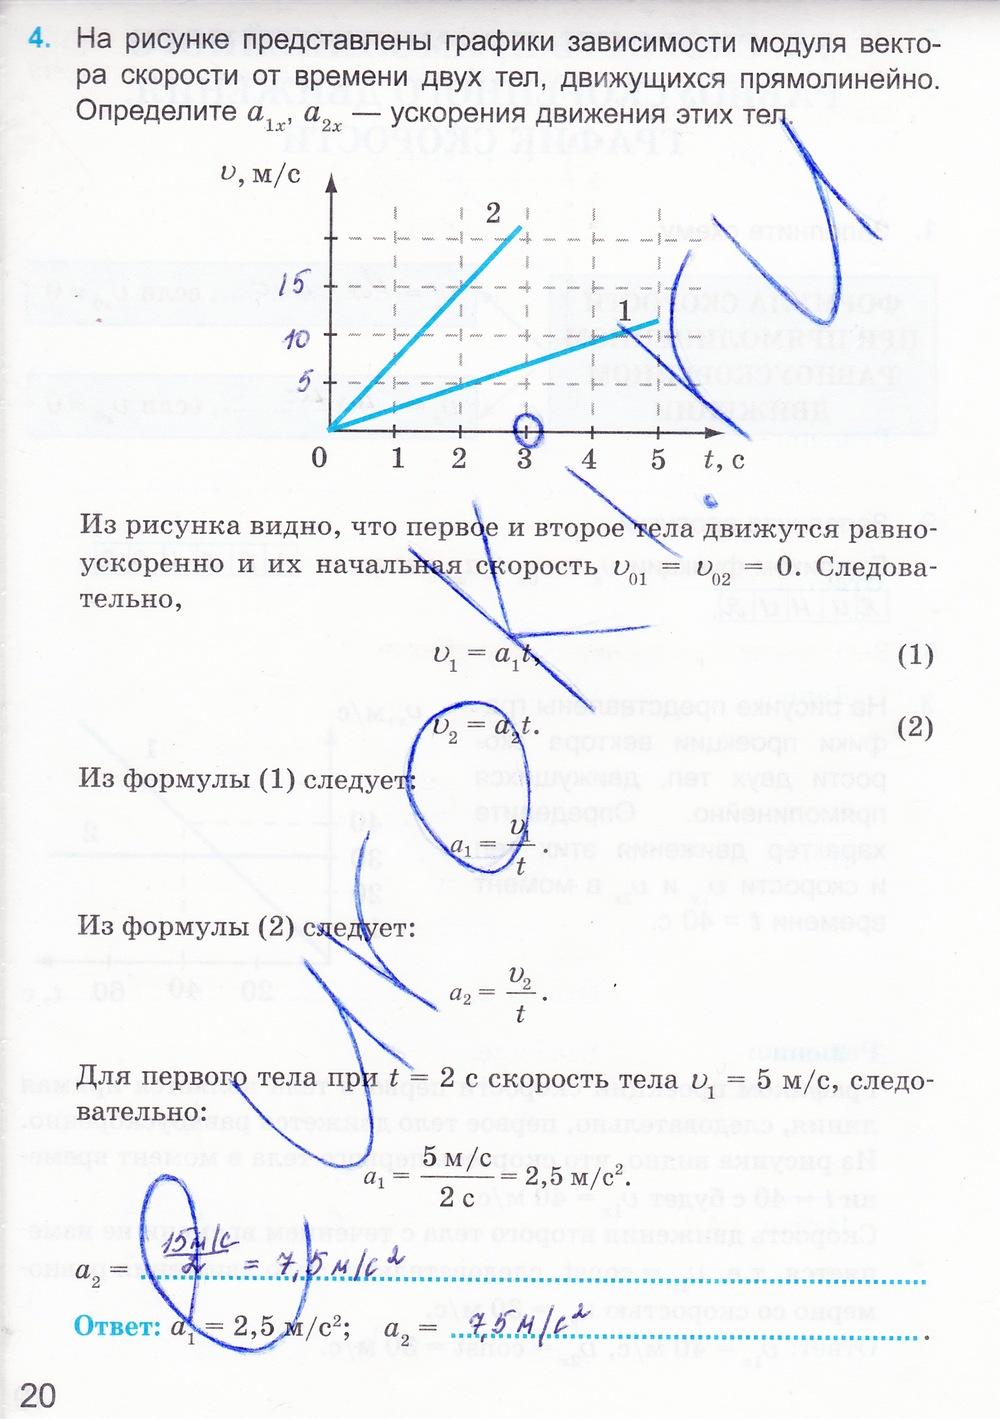 задачи по физике в.ф дмитриева решебник